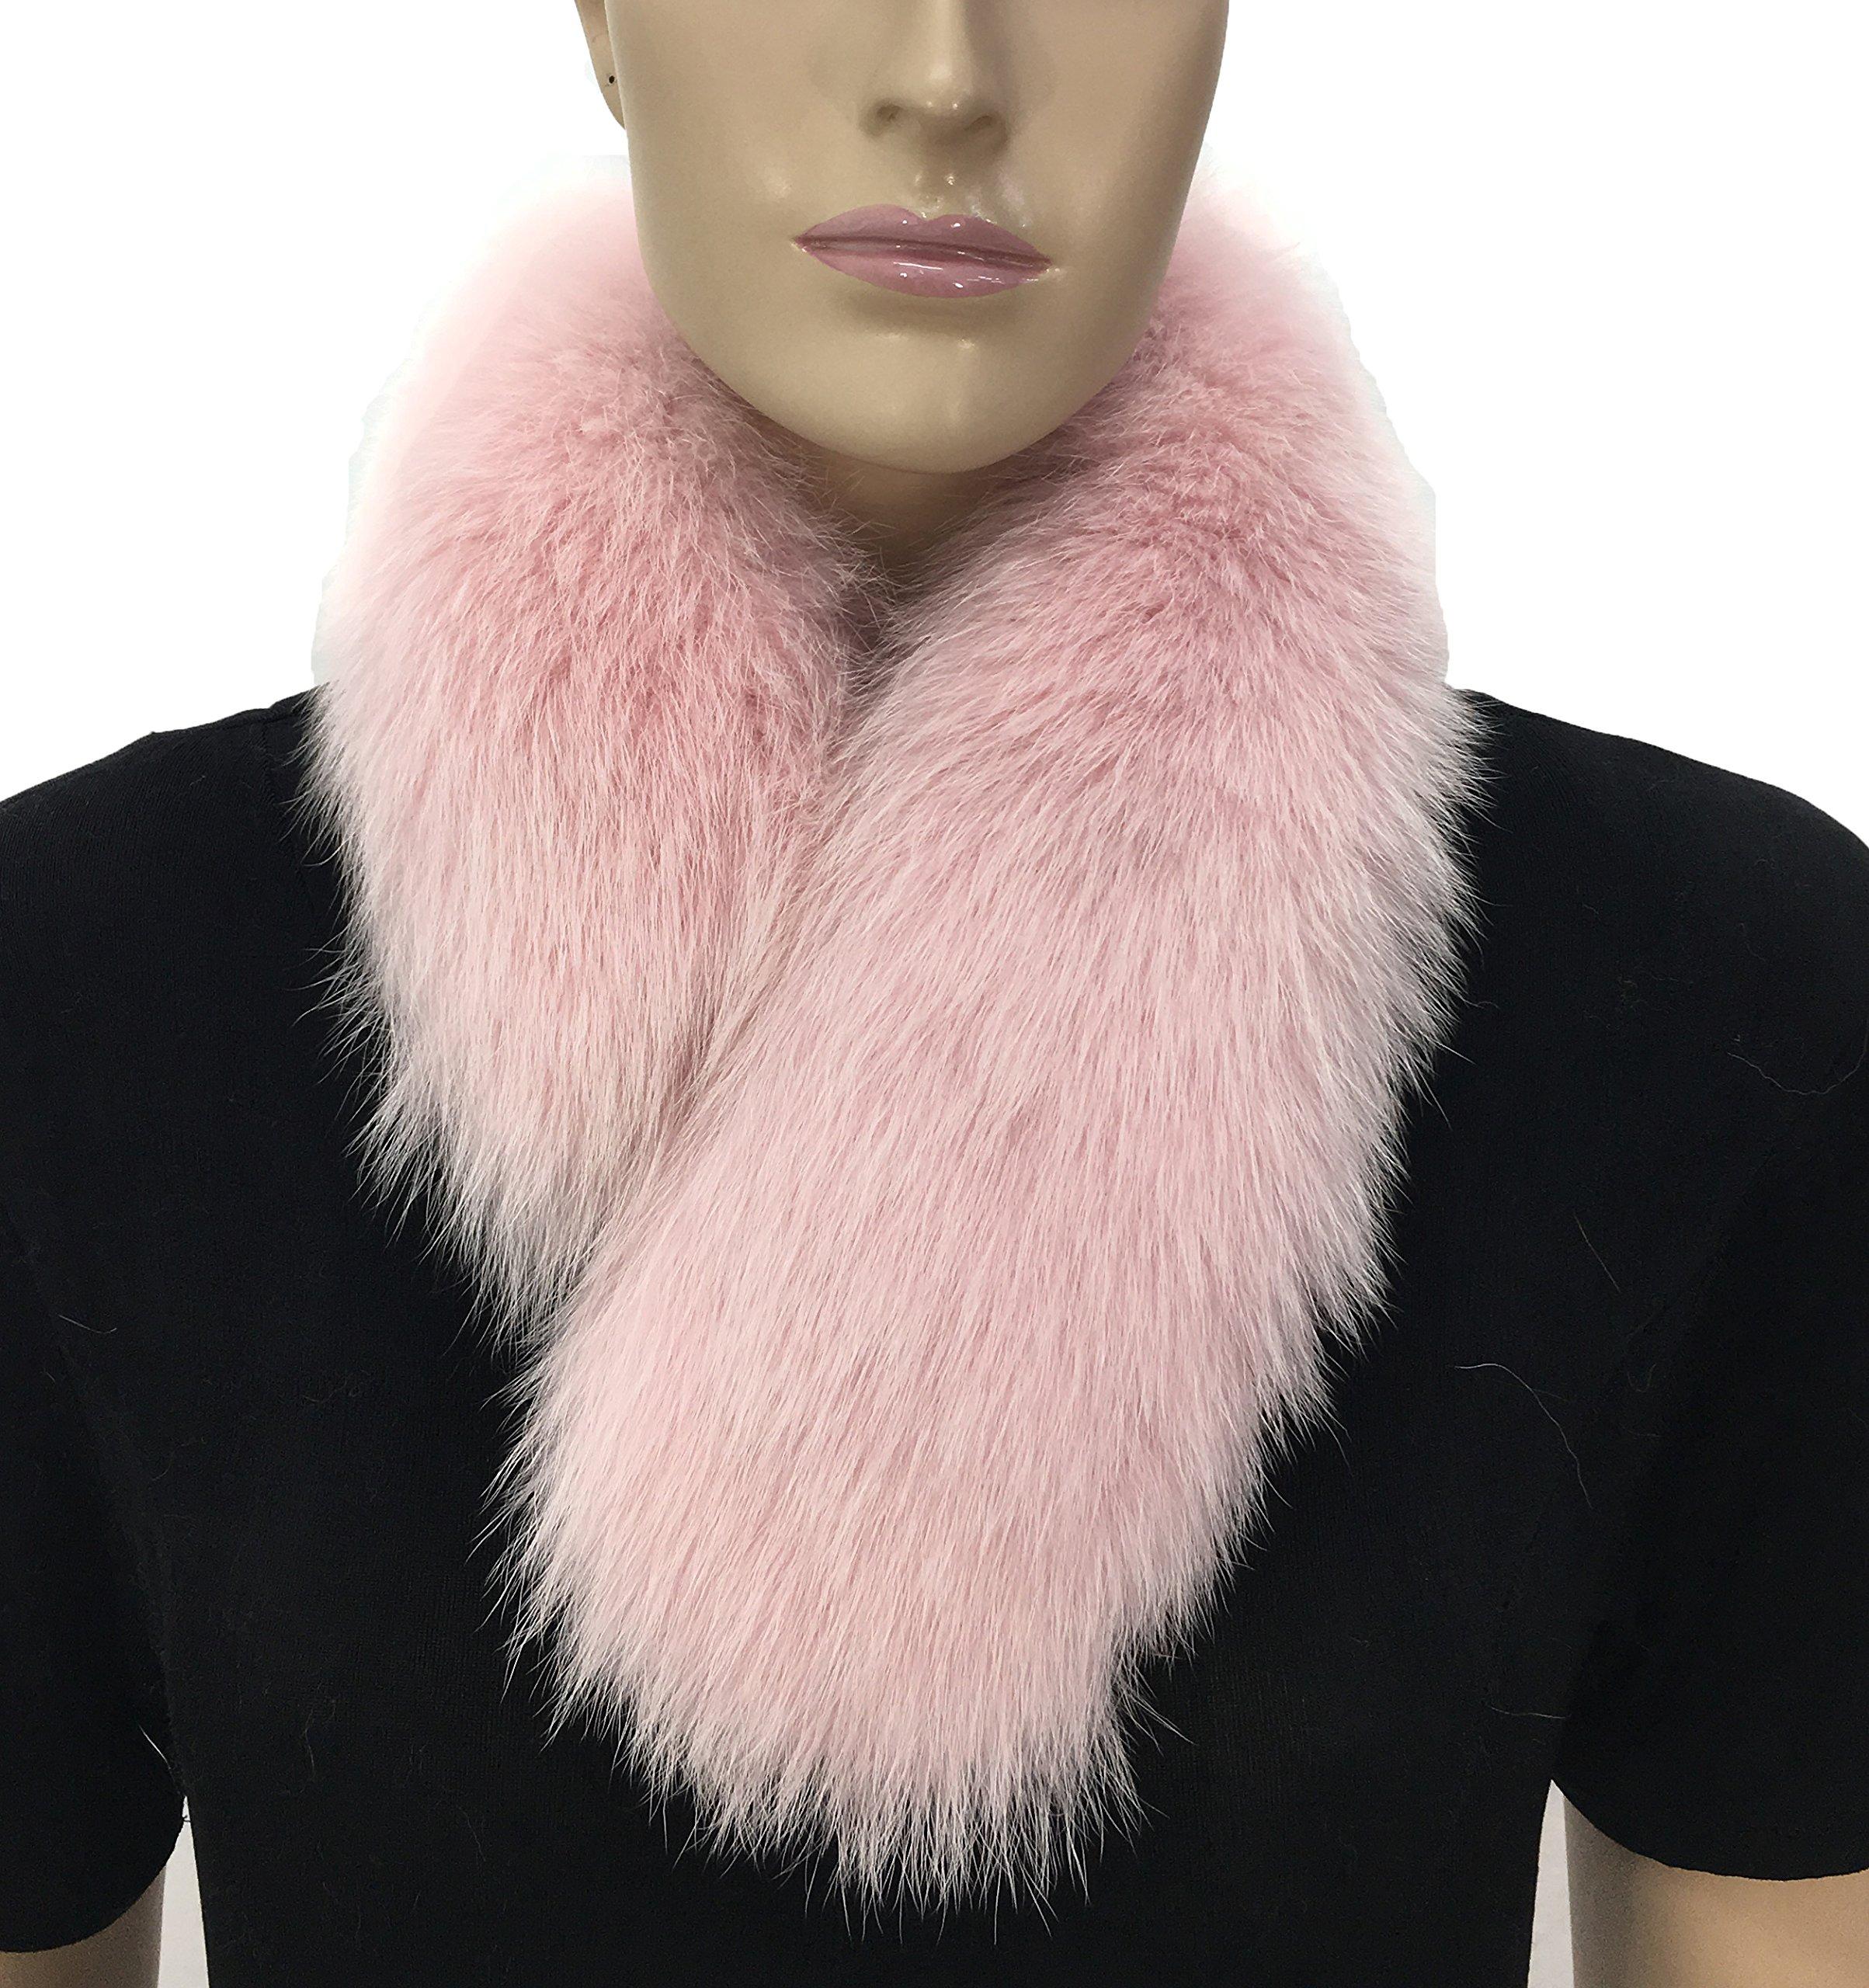 HIMA 100% Real Fox Fur Headband (Baby Pink) by Hima